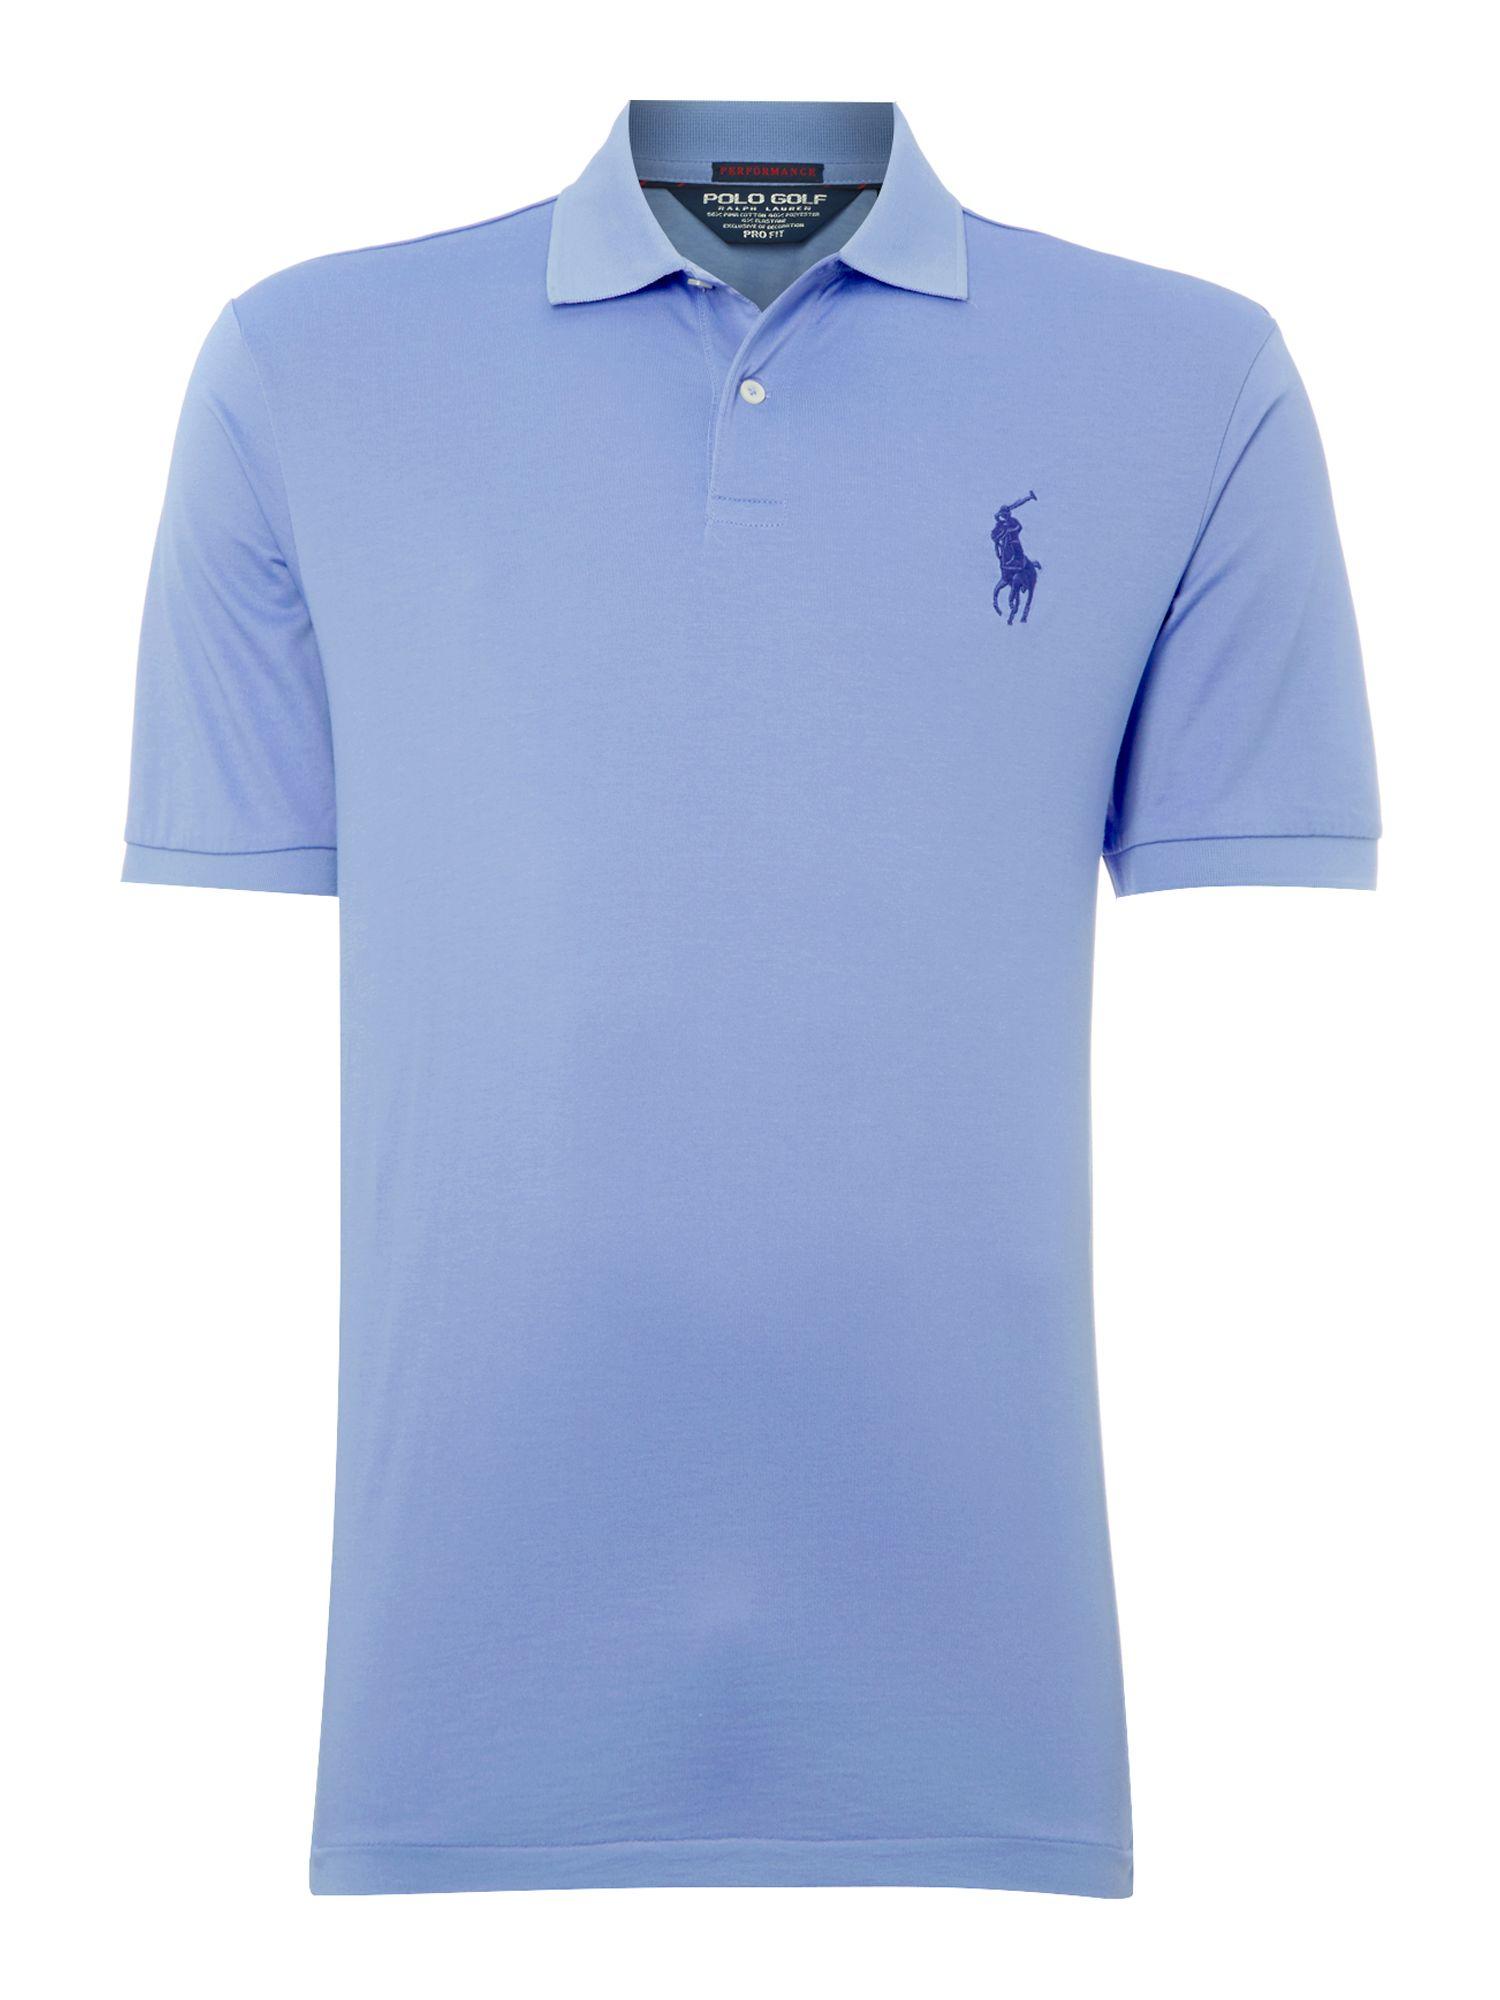 Ralph lauren golf moisture wicking pro fit polo shirt in for Moisture wicking dress shirts